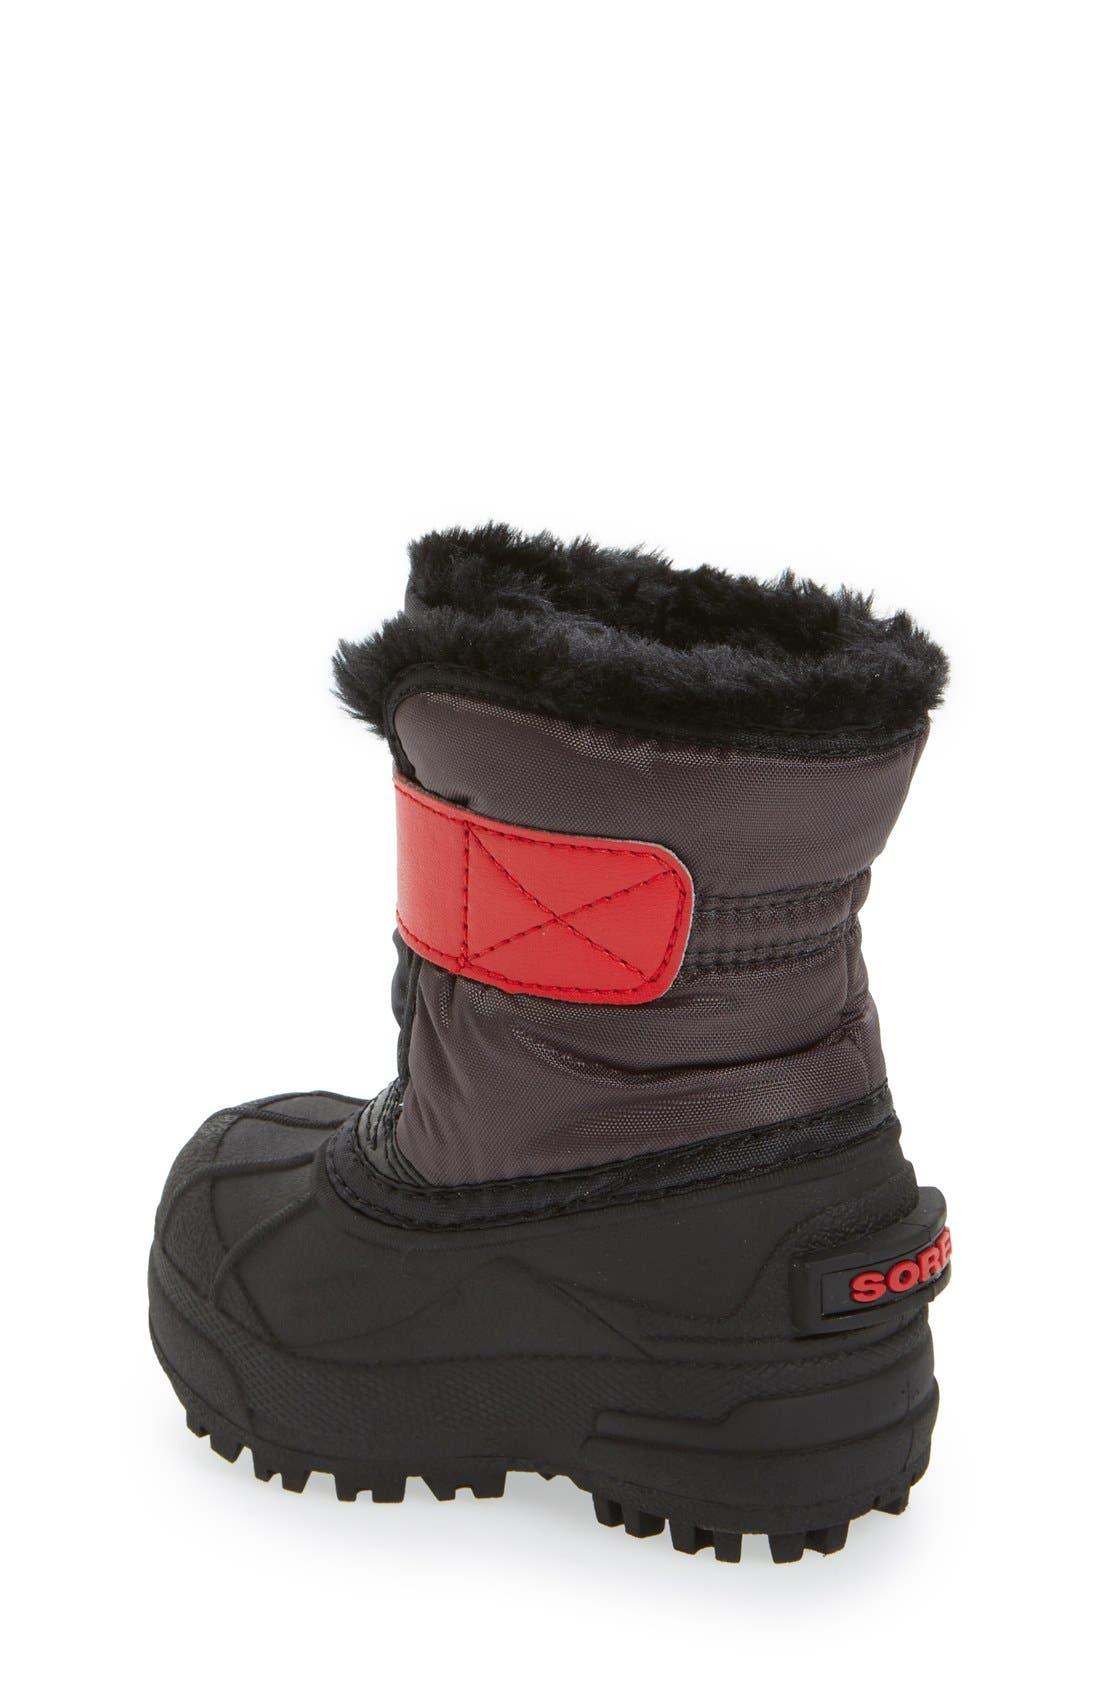 'Snow Commander' Boot,                             Alternate thumbnail 2, color,                             Dark Grey/ Bright Red